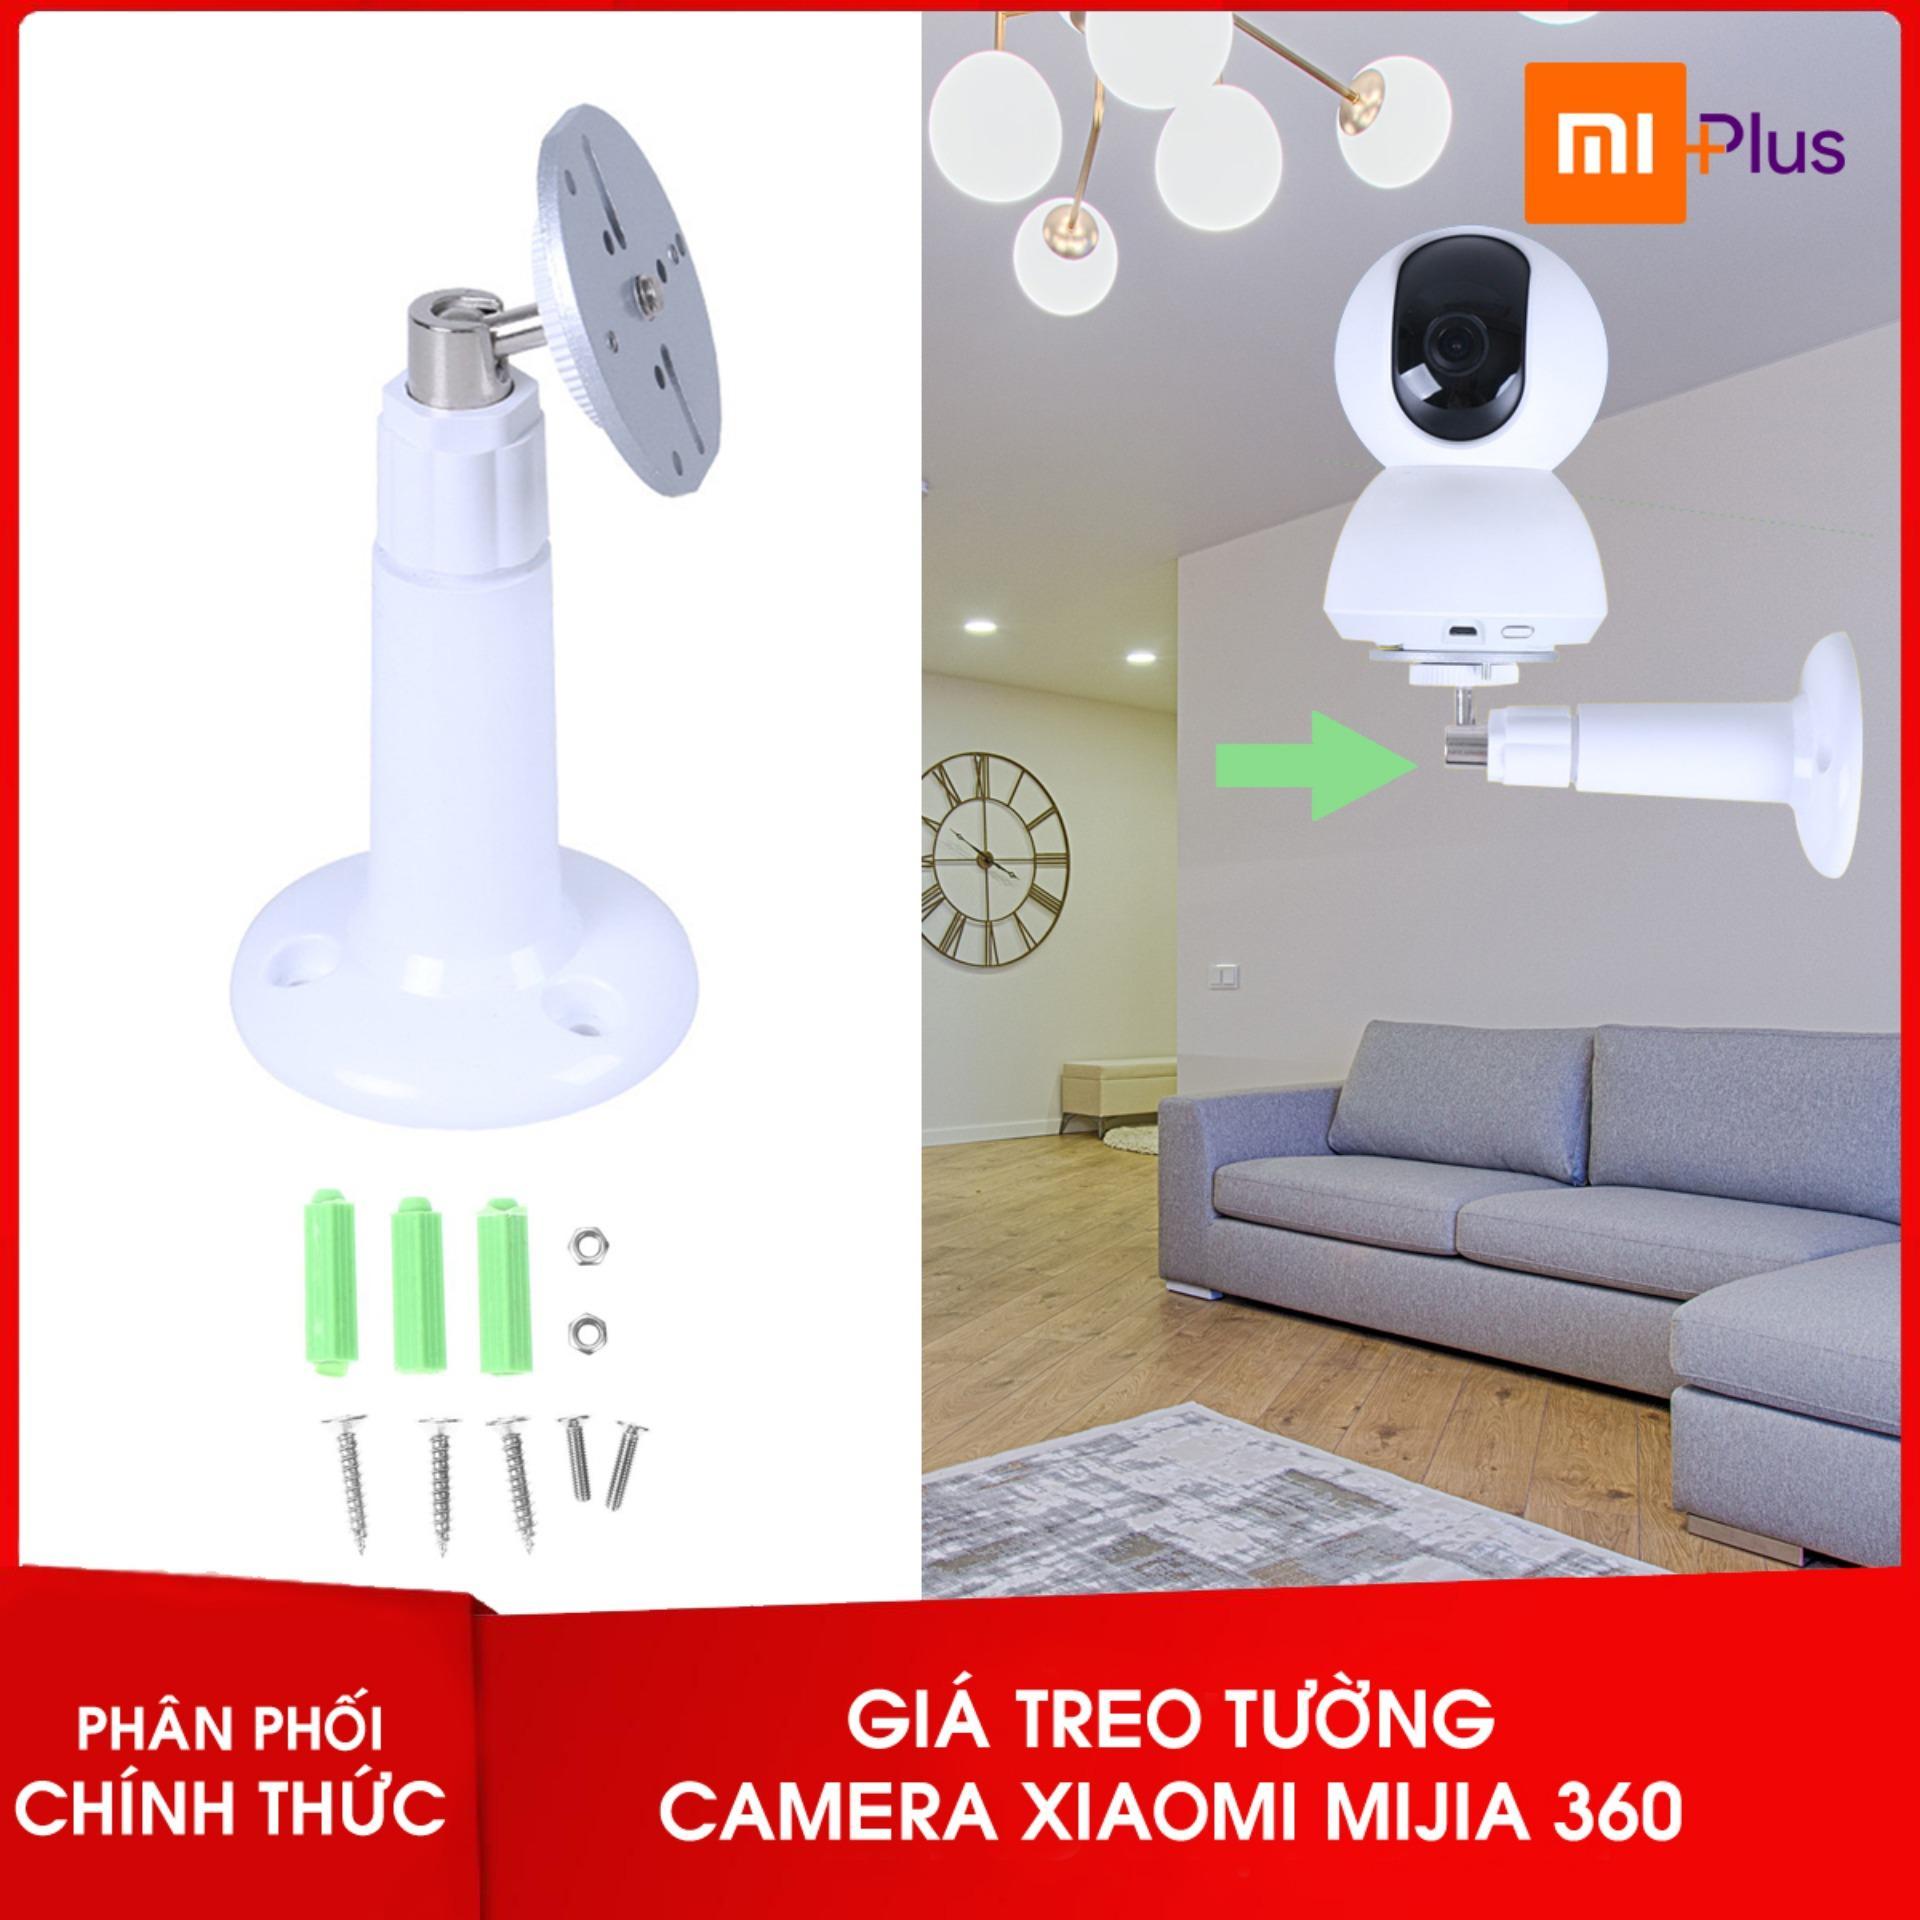 Giá đỡ treo tường cho camera giám sát Xiaomi Mi Home Security 360